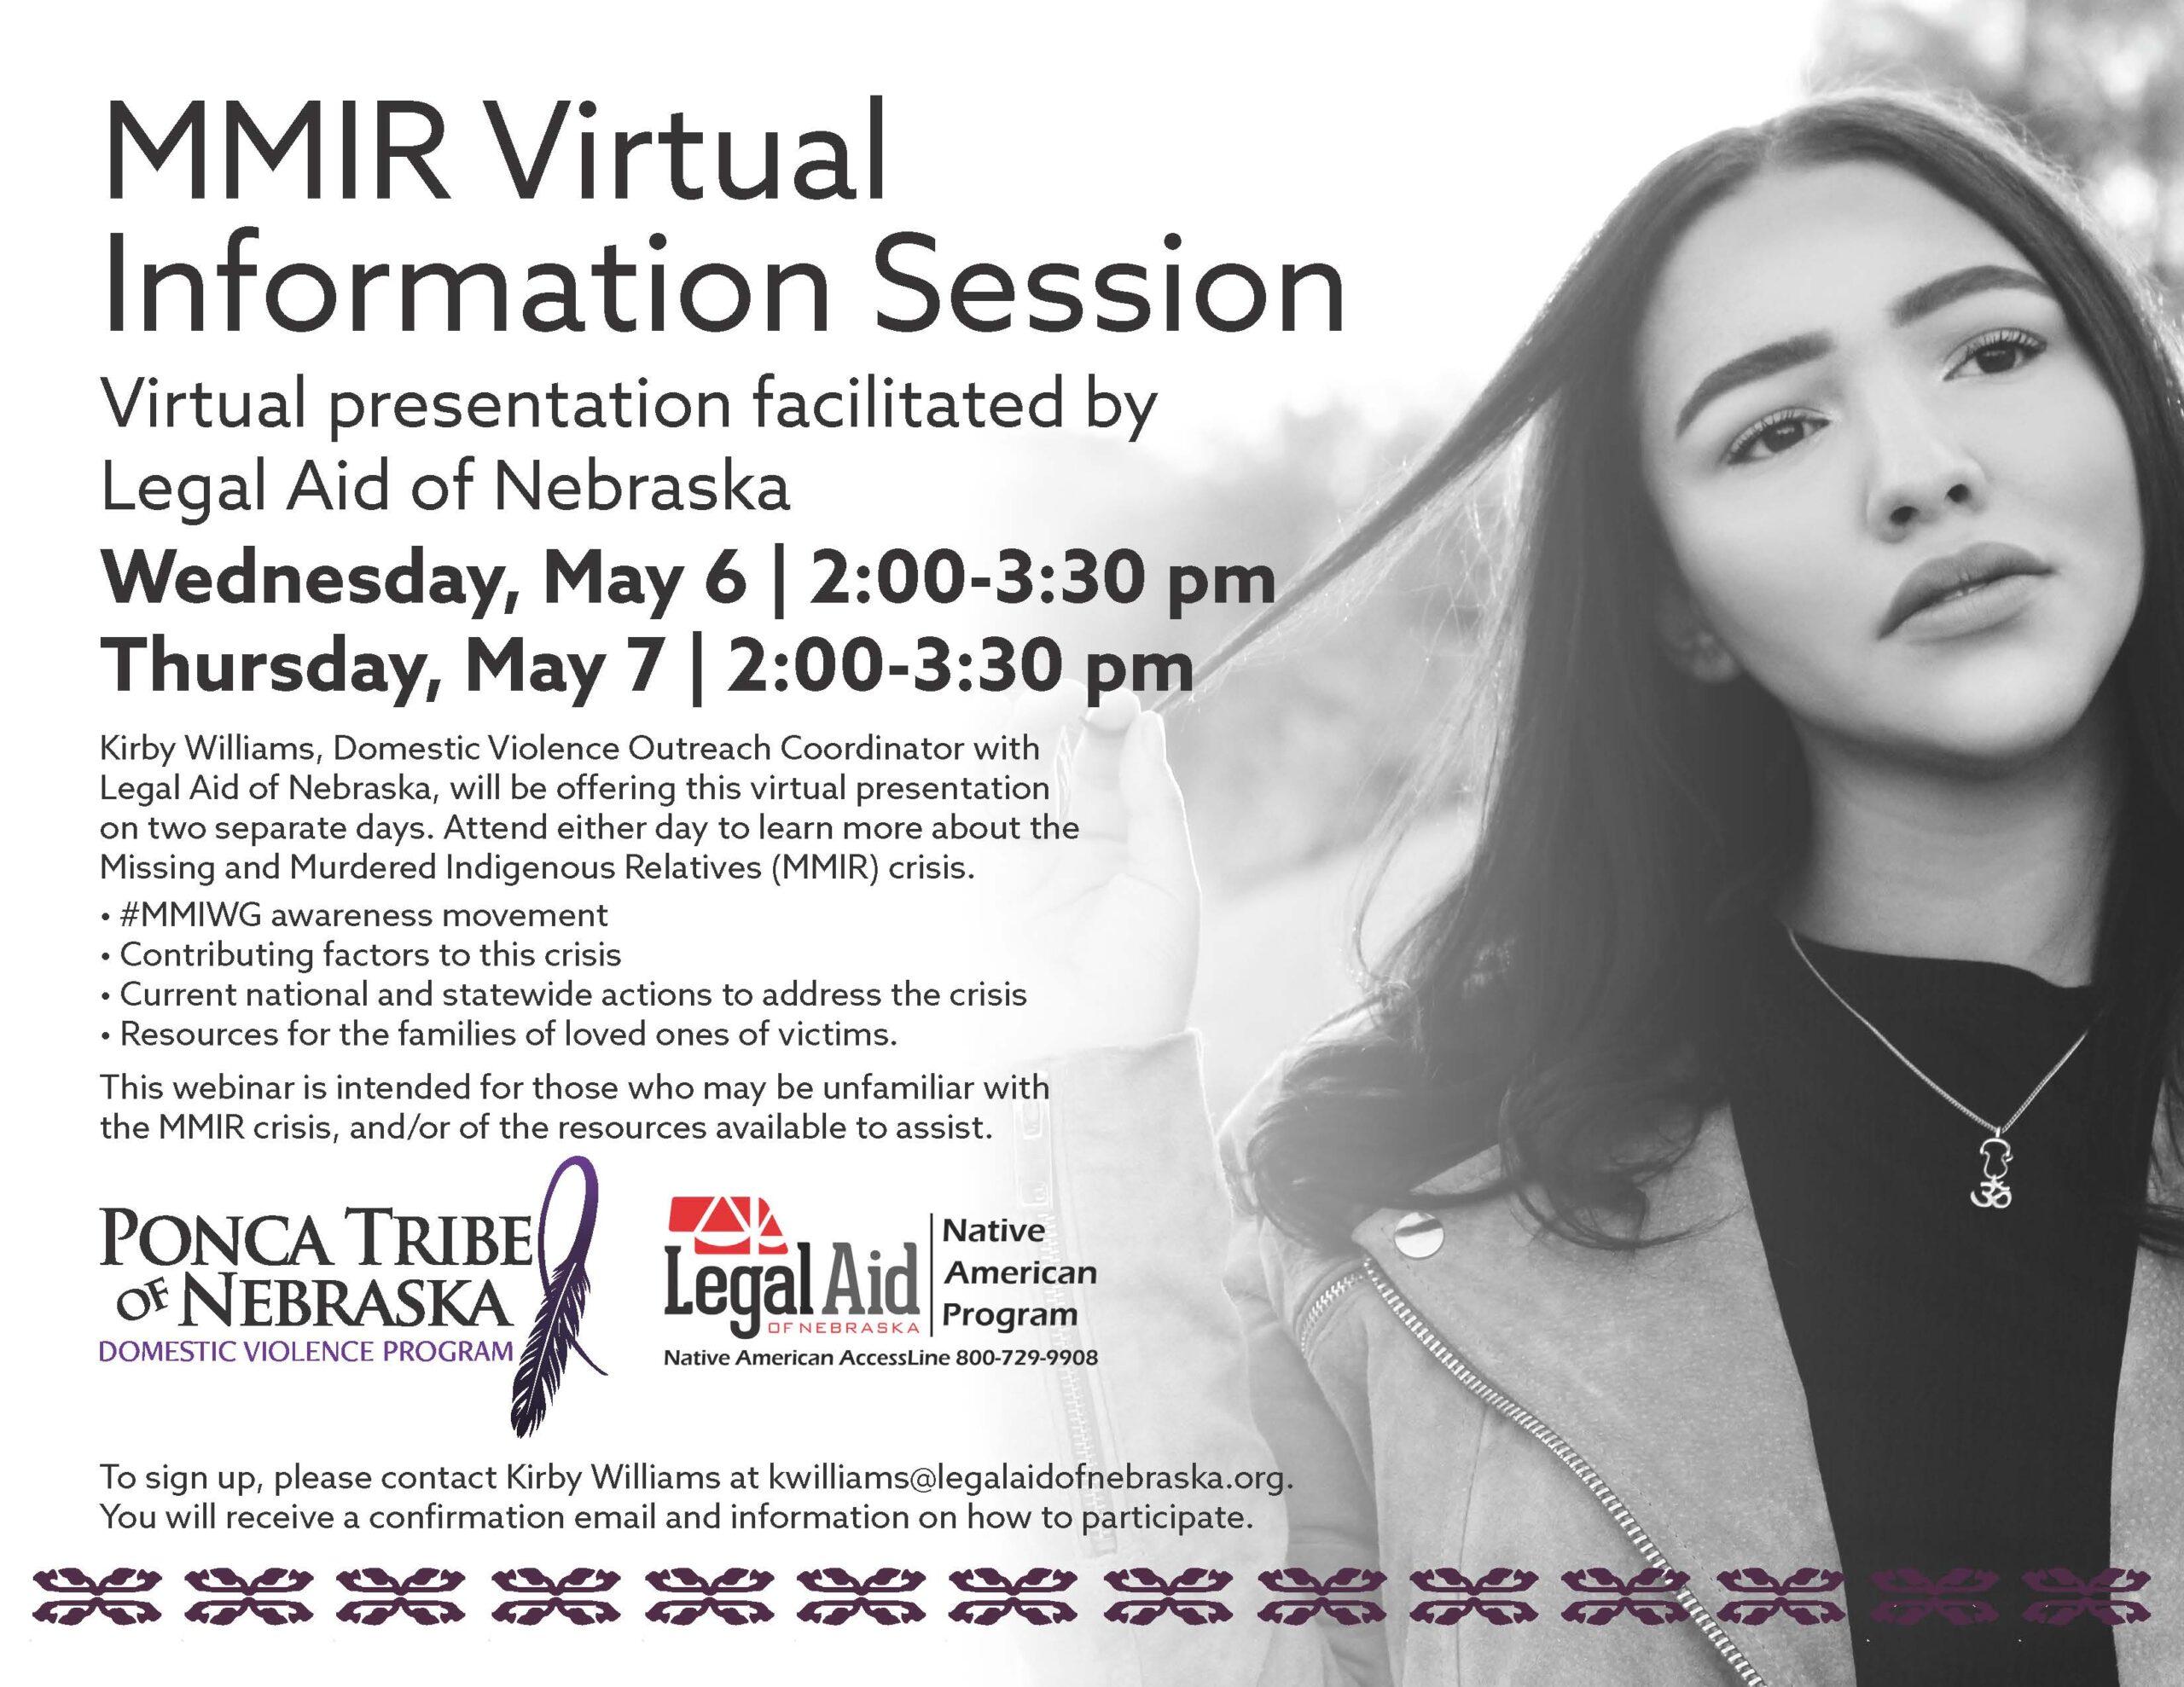 MMIR Information Session